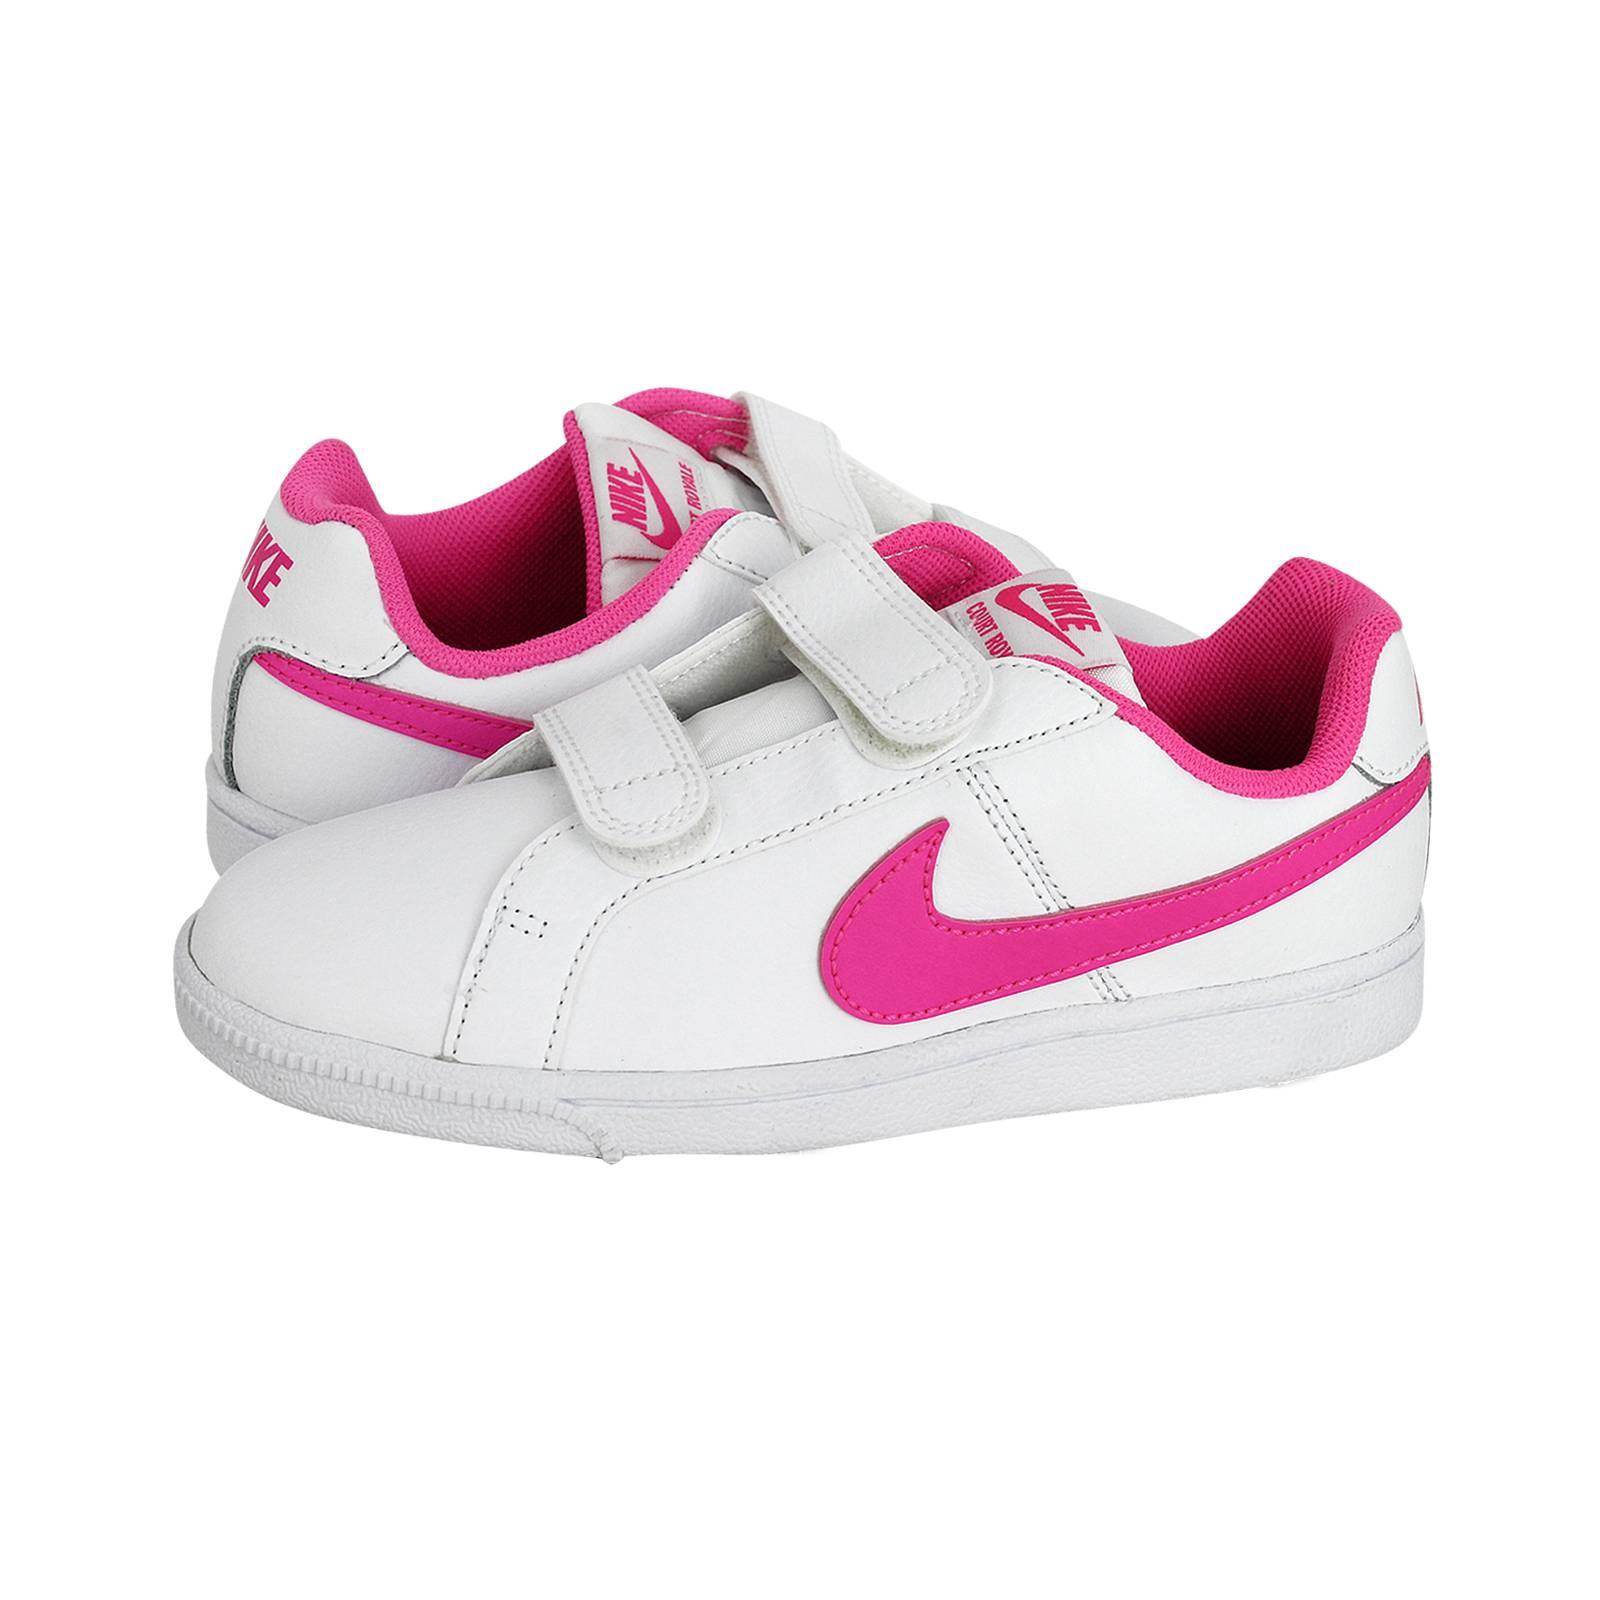 7b22338e8af Court Royale - Παιδικά αθλητικά παπούτσια Nike από δέρμα - Gianna ...